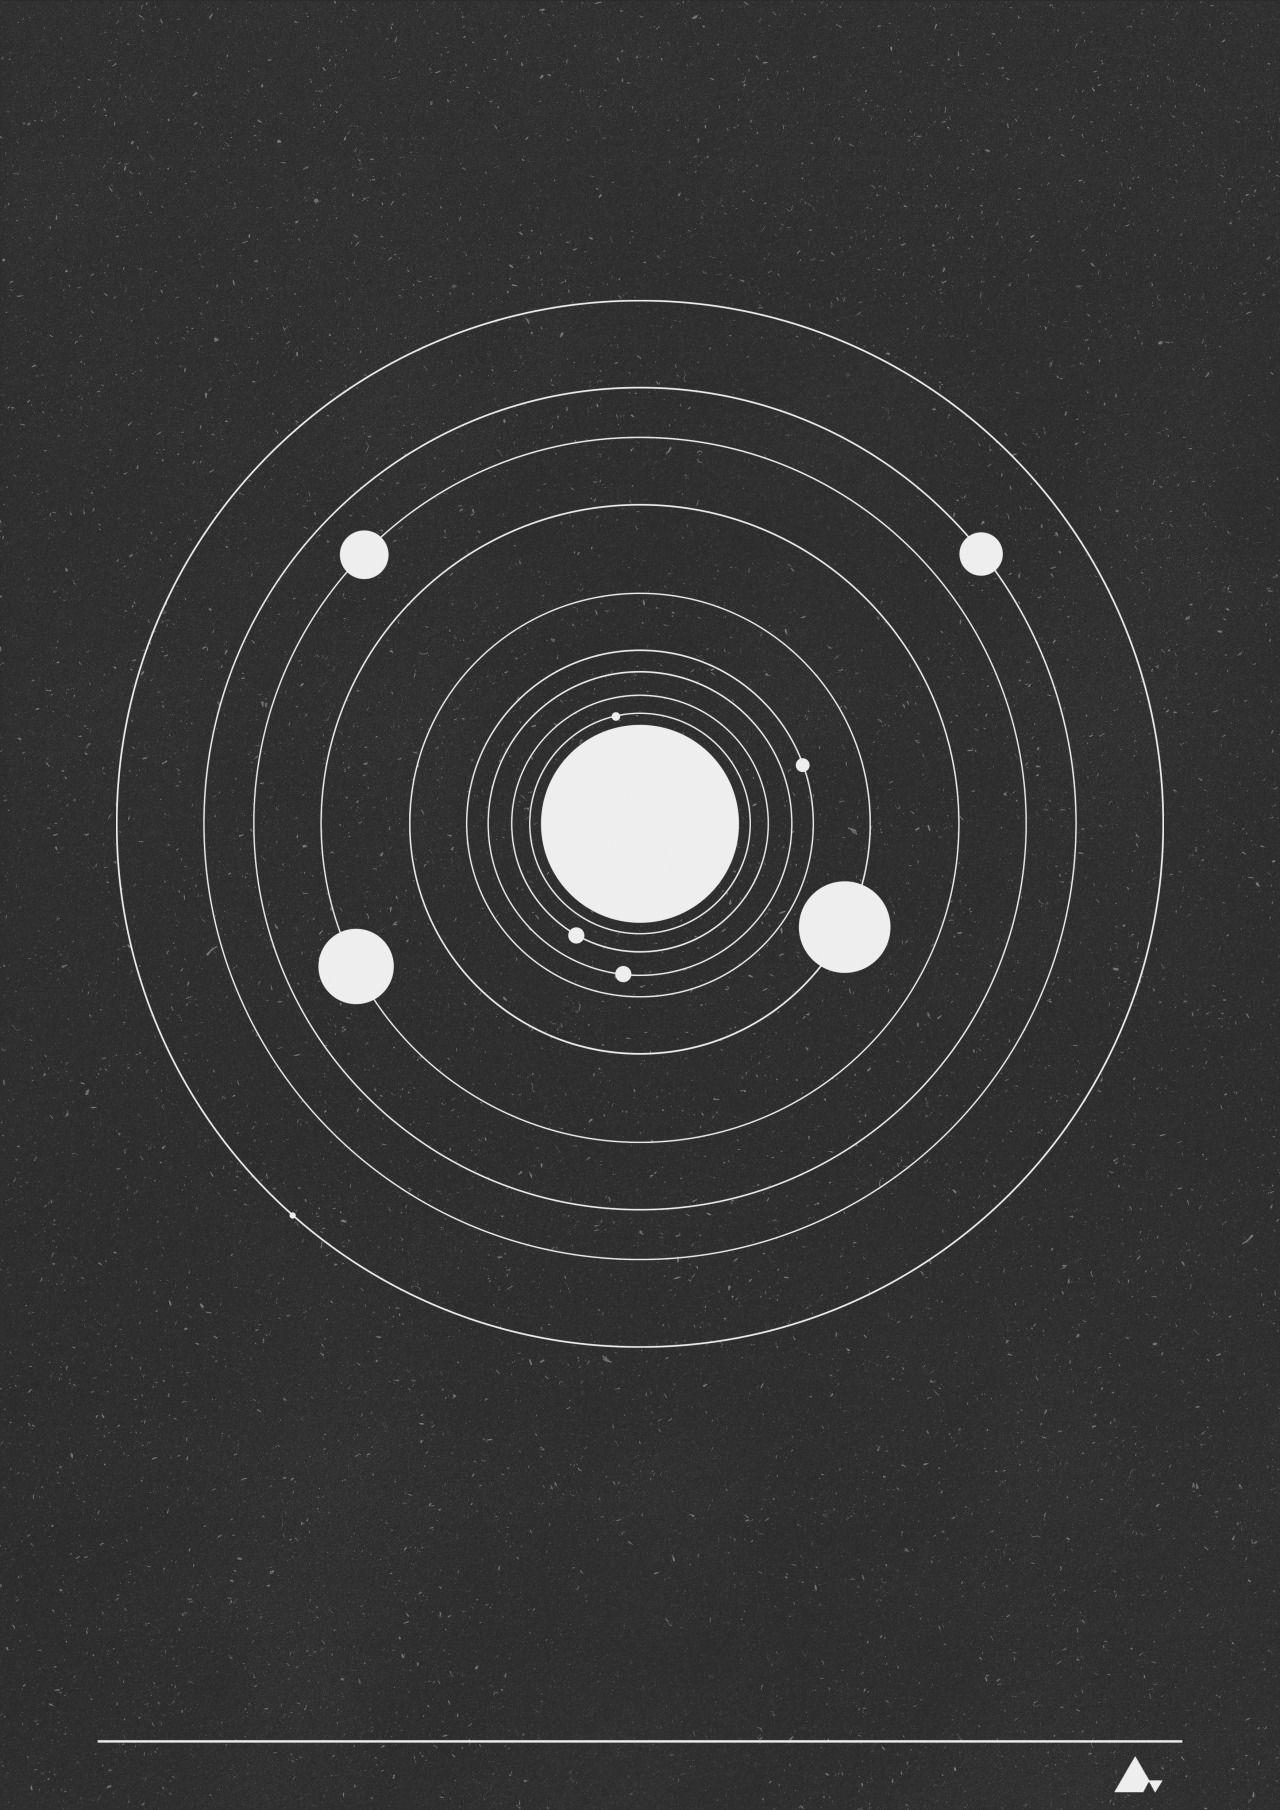 Solar System 3 Art print design Solar system tattoo